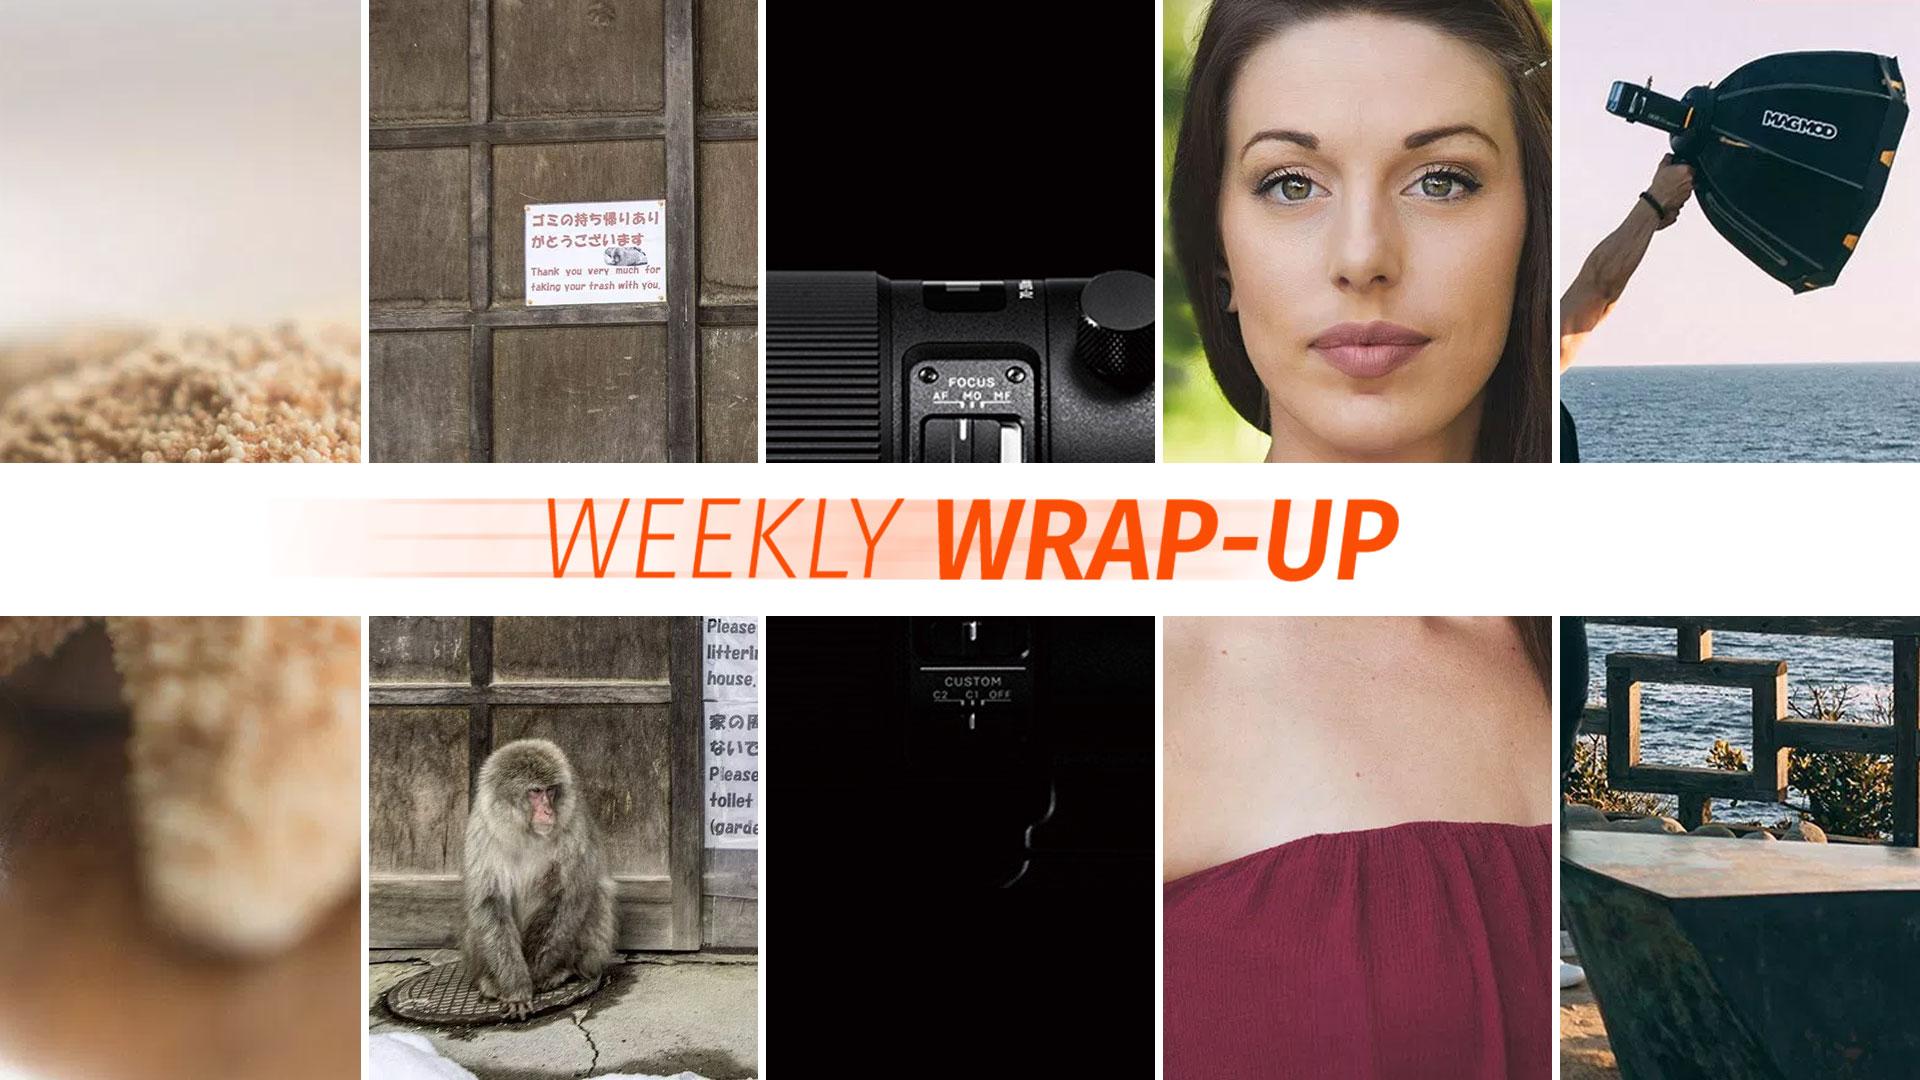 weekly-wrapup-111018